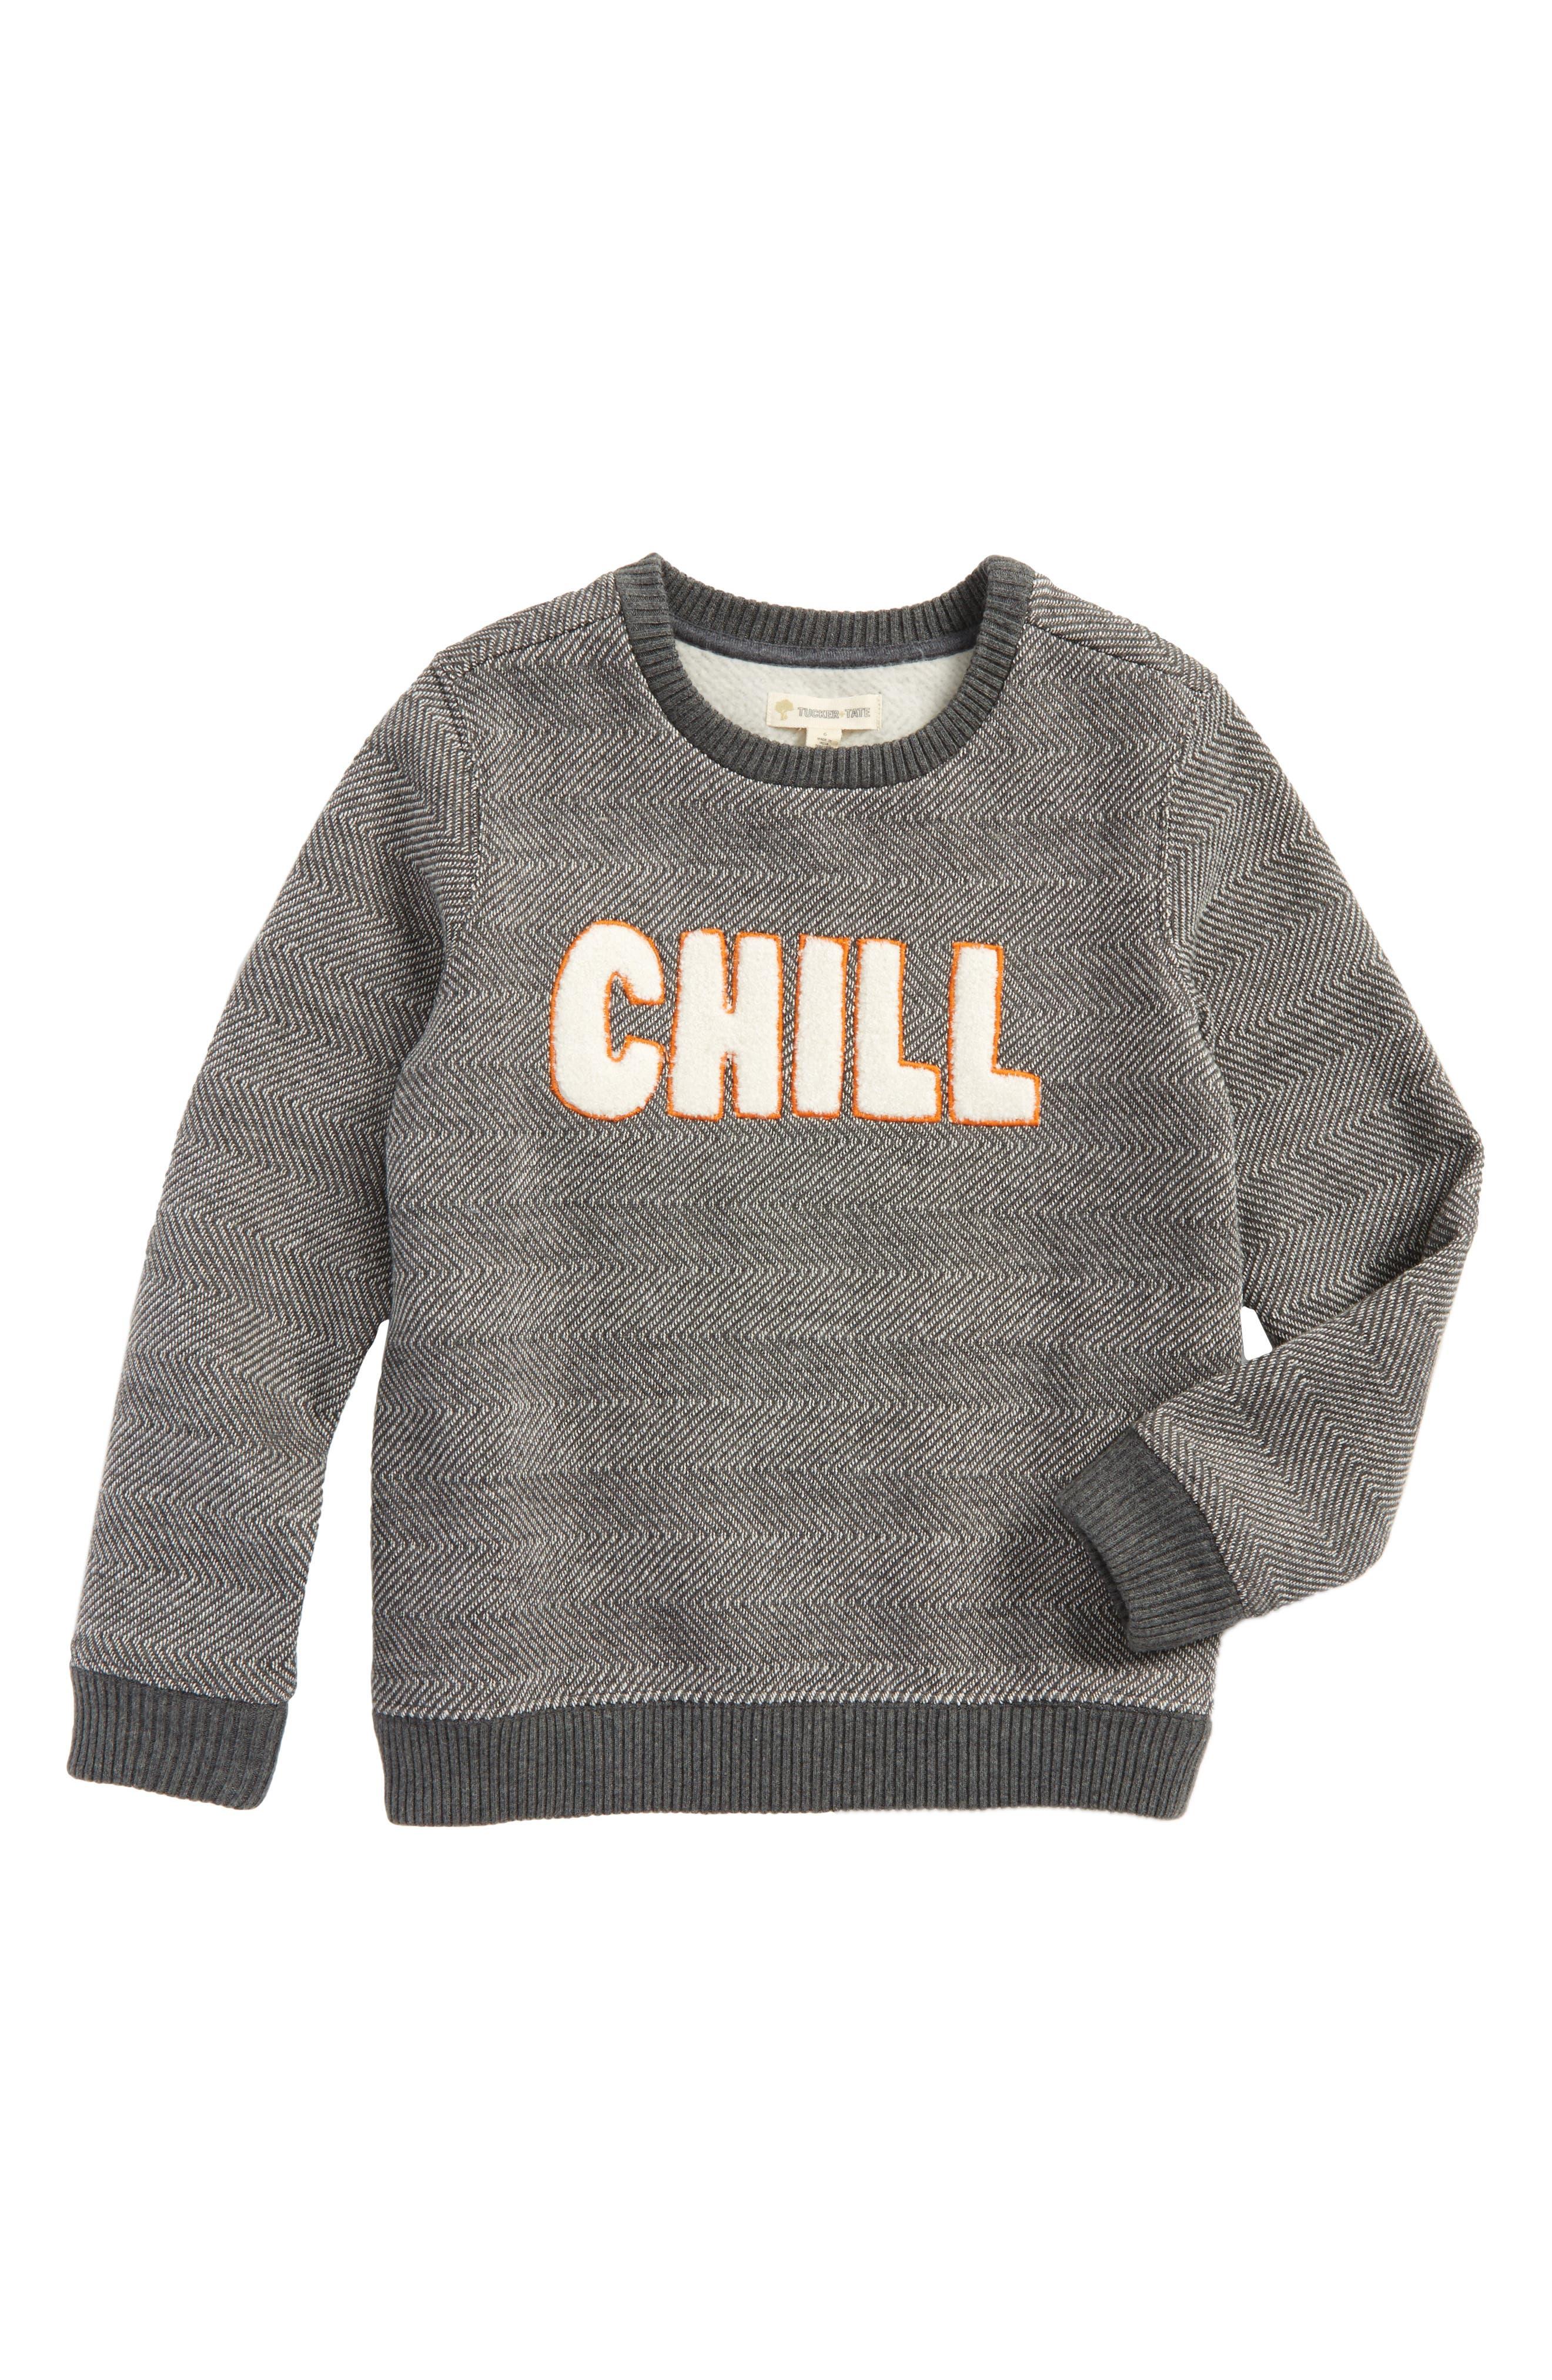 Tucker + Tate Fleece Sweatshirt (Toddler Boys & Little Boys)